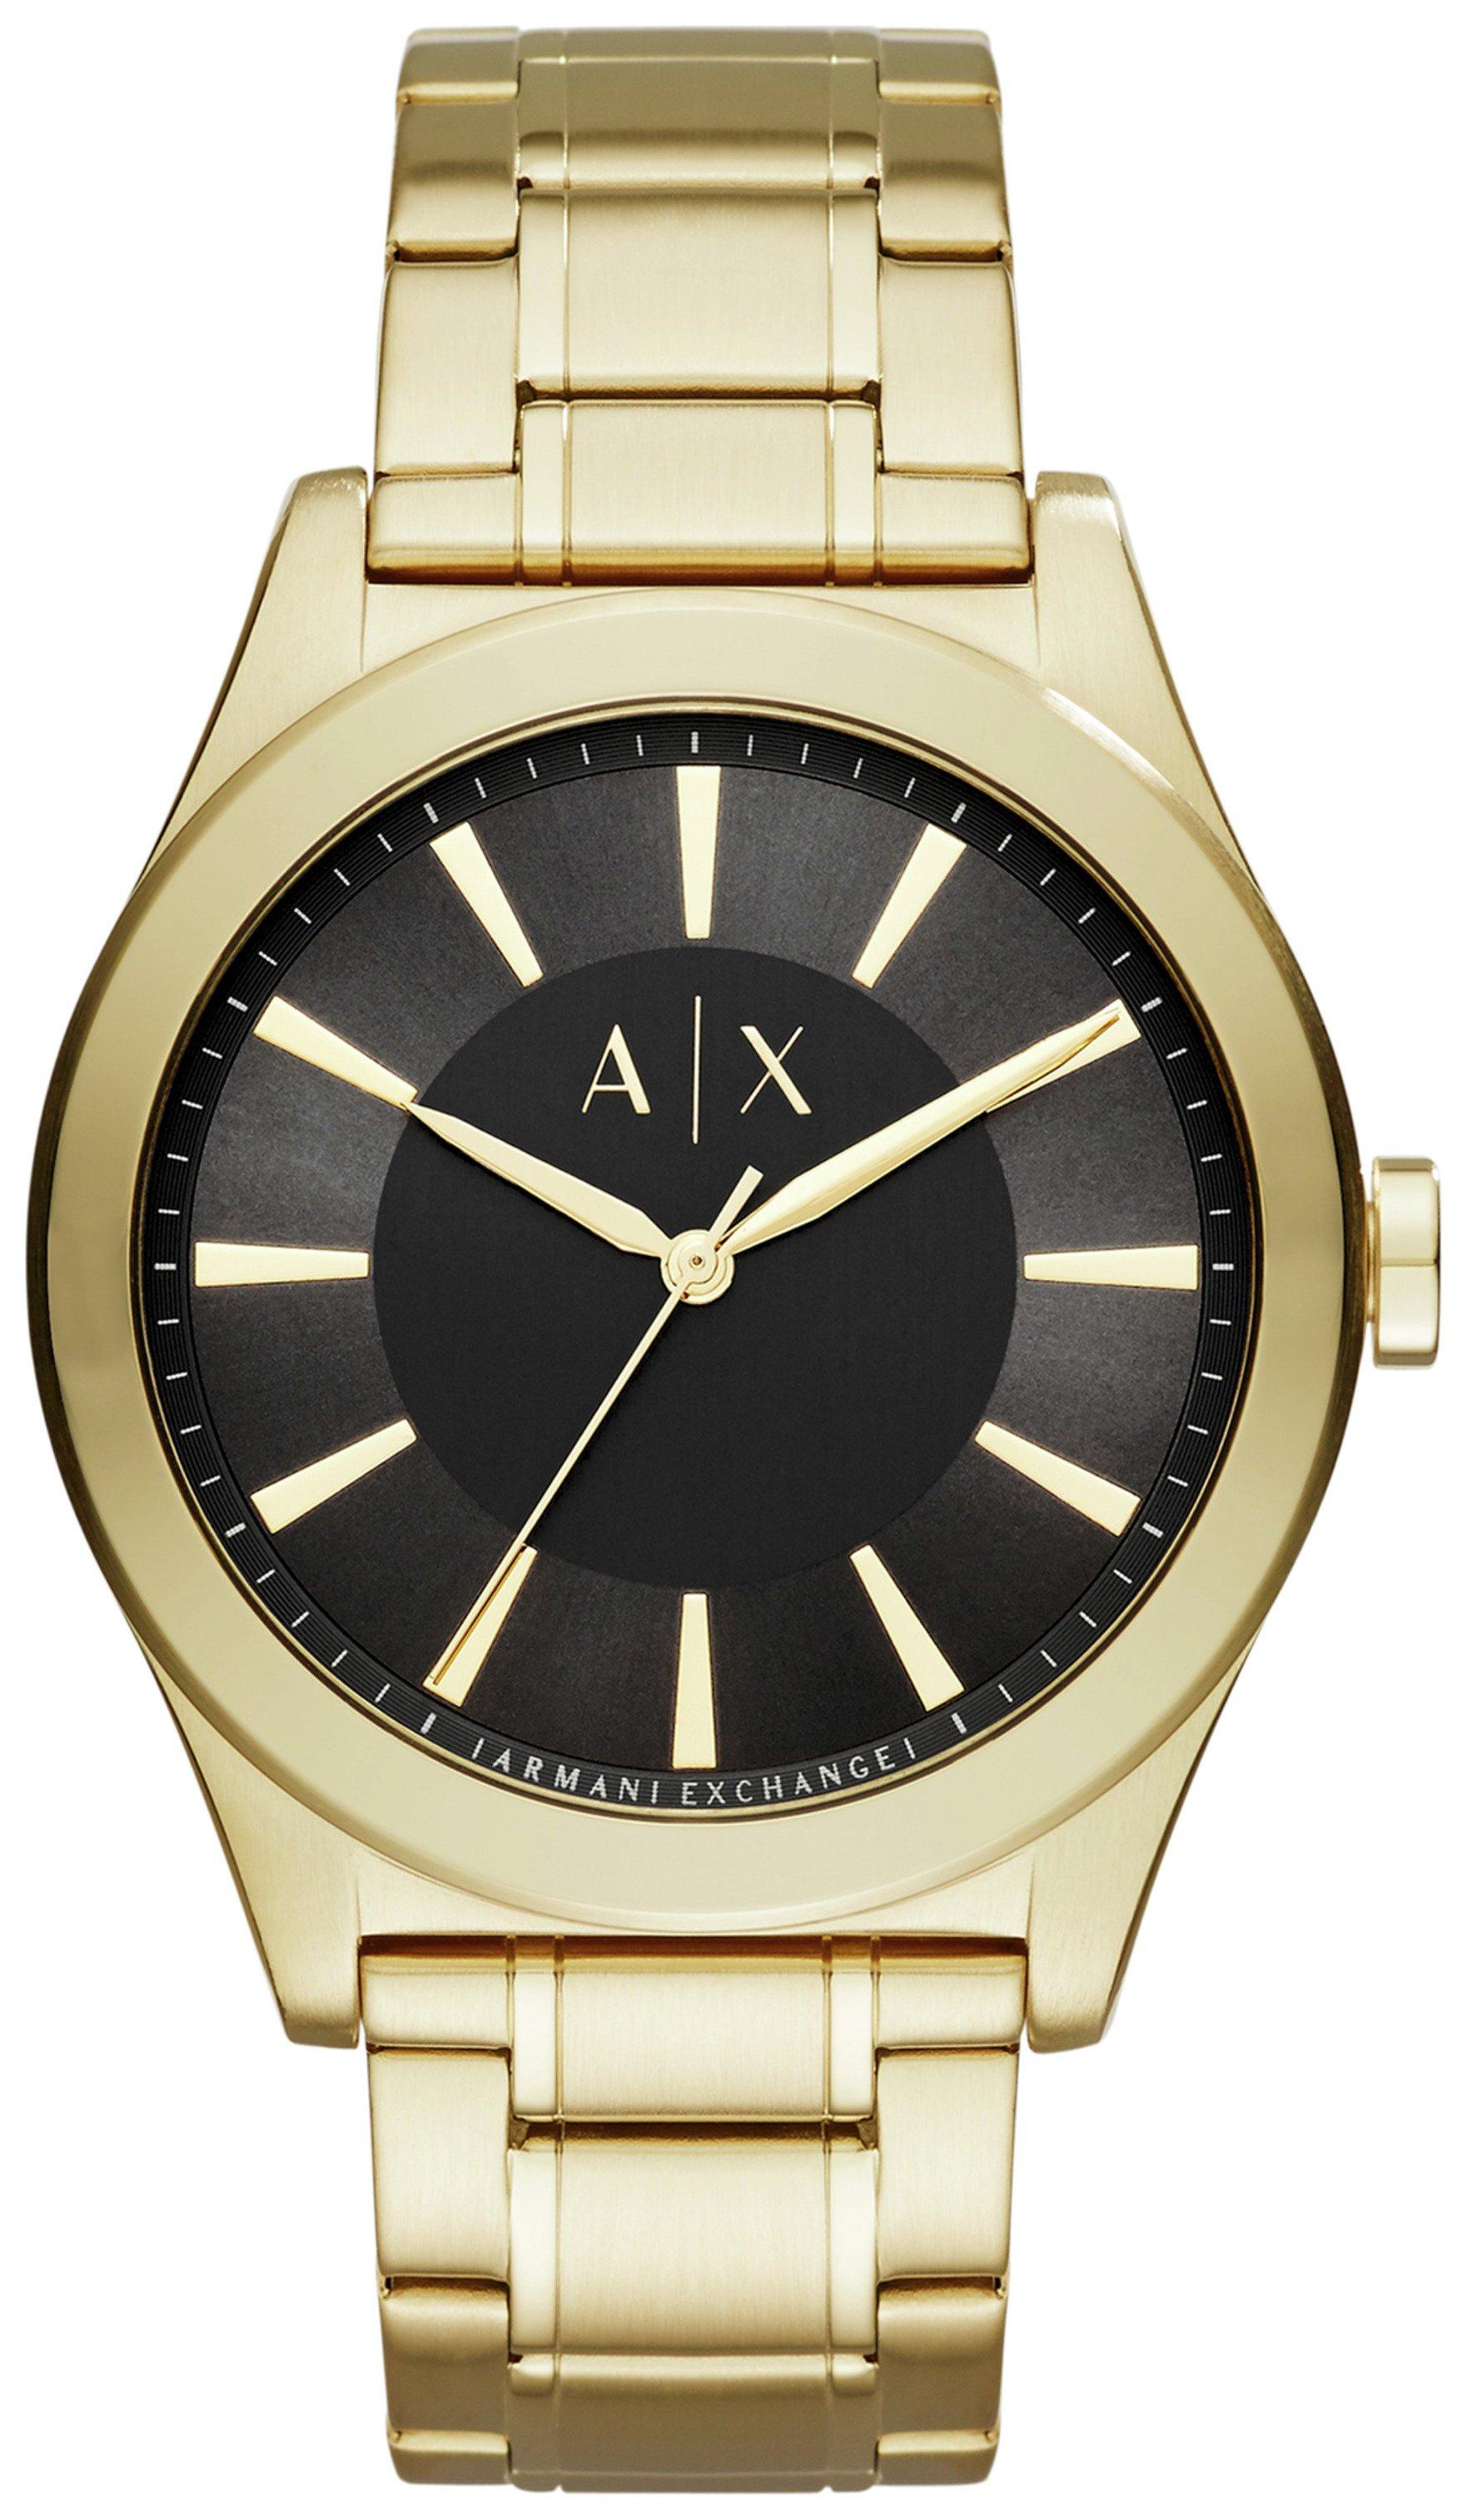 Armani Exchange Men's Gold Tone Steel Bracelet Watch